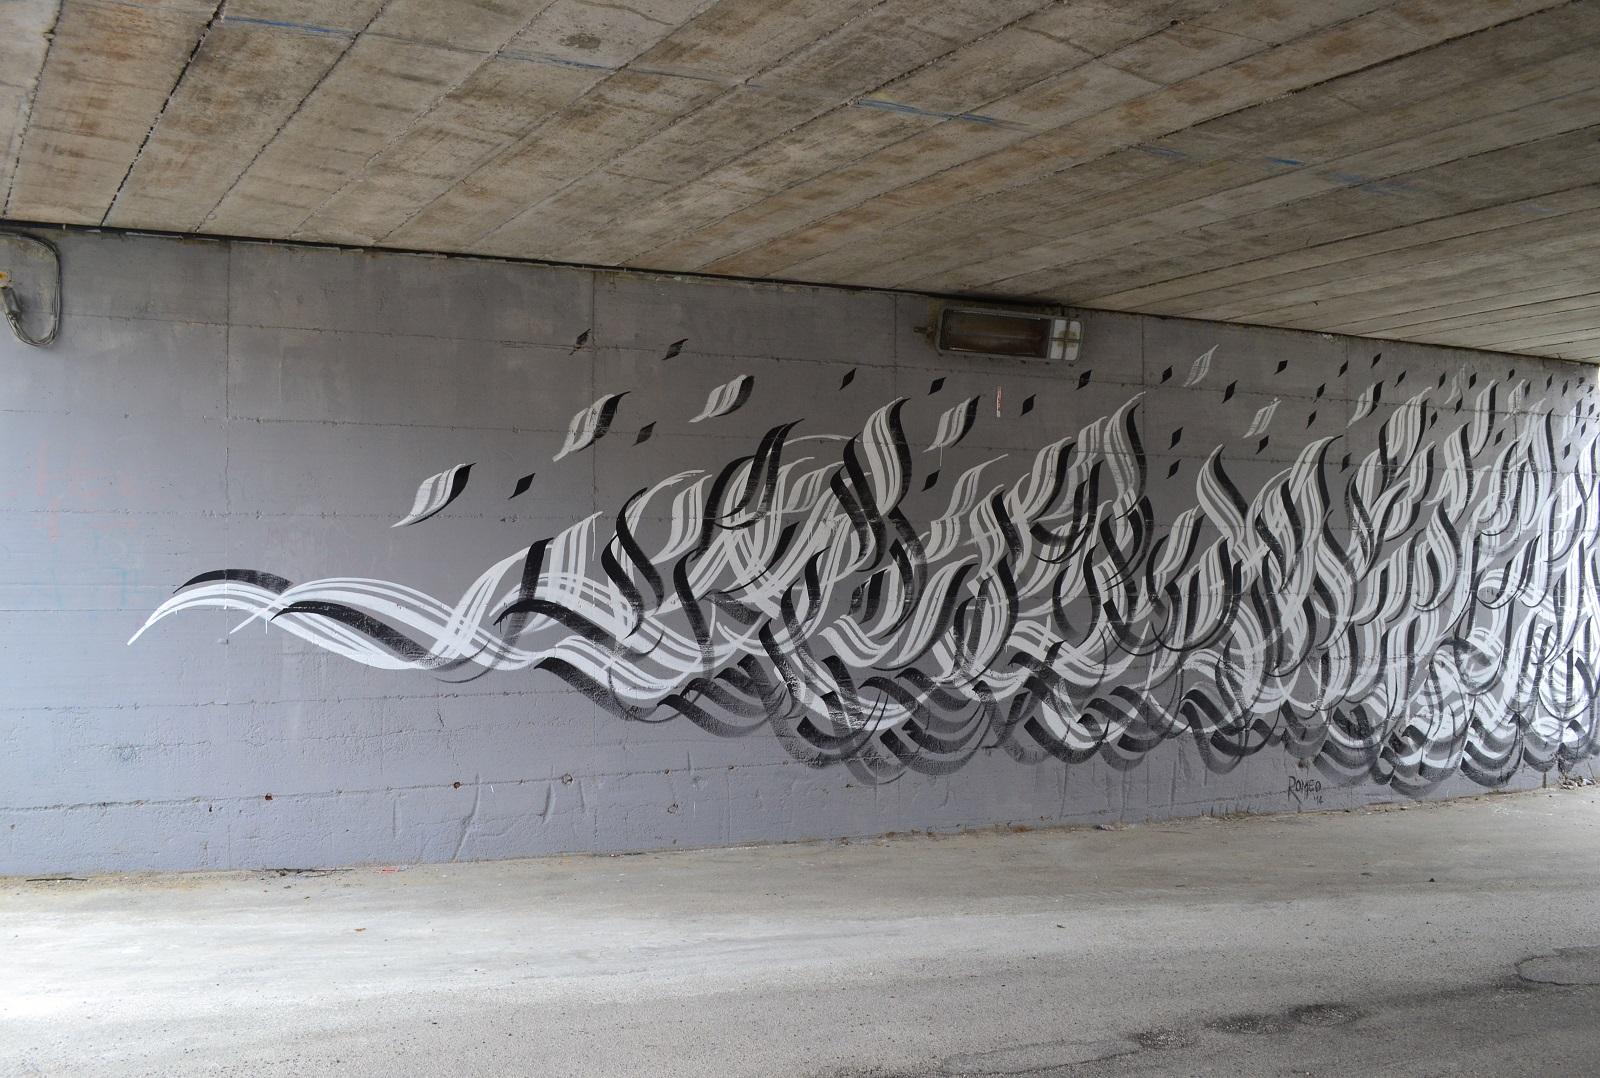 domenico-romeo-for-urban-canvas-in-varese-07